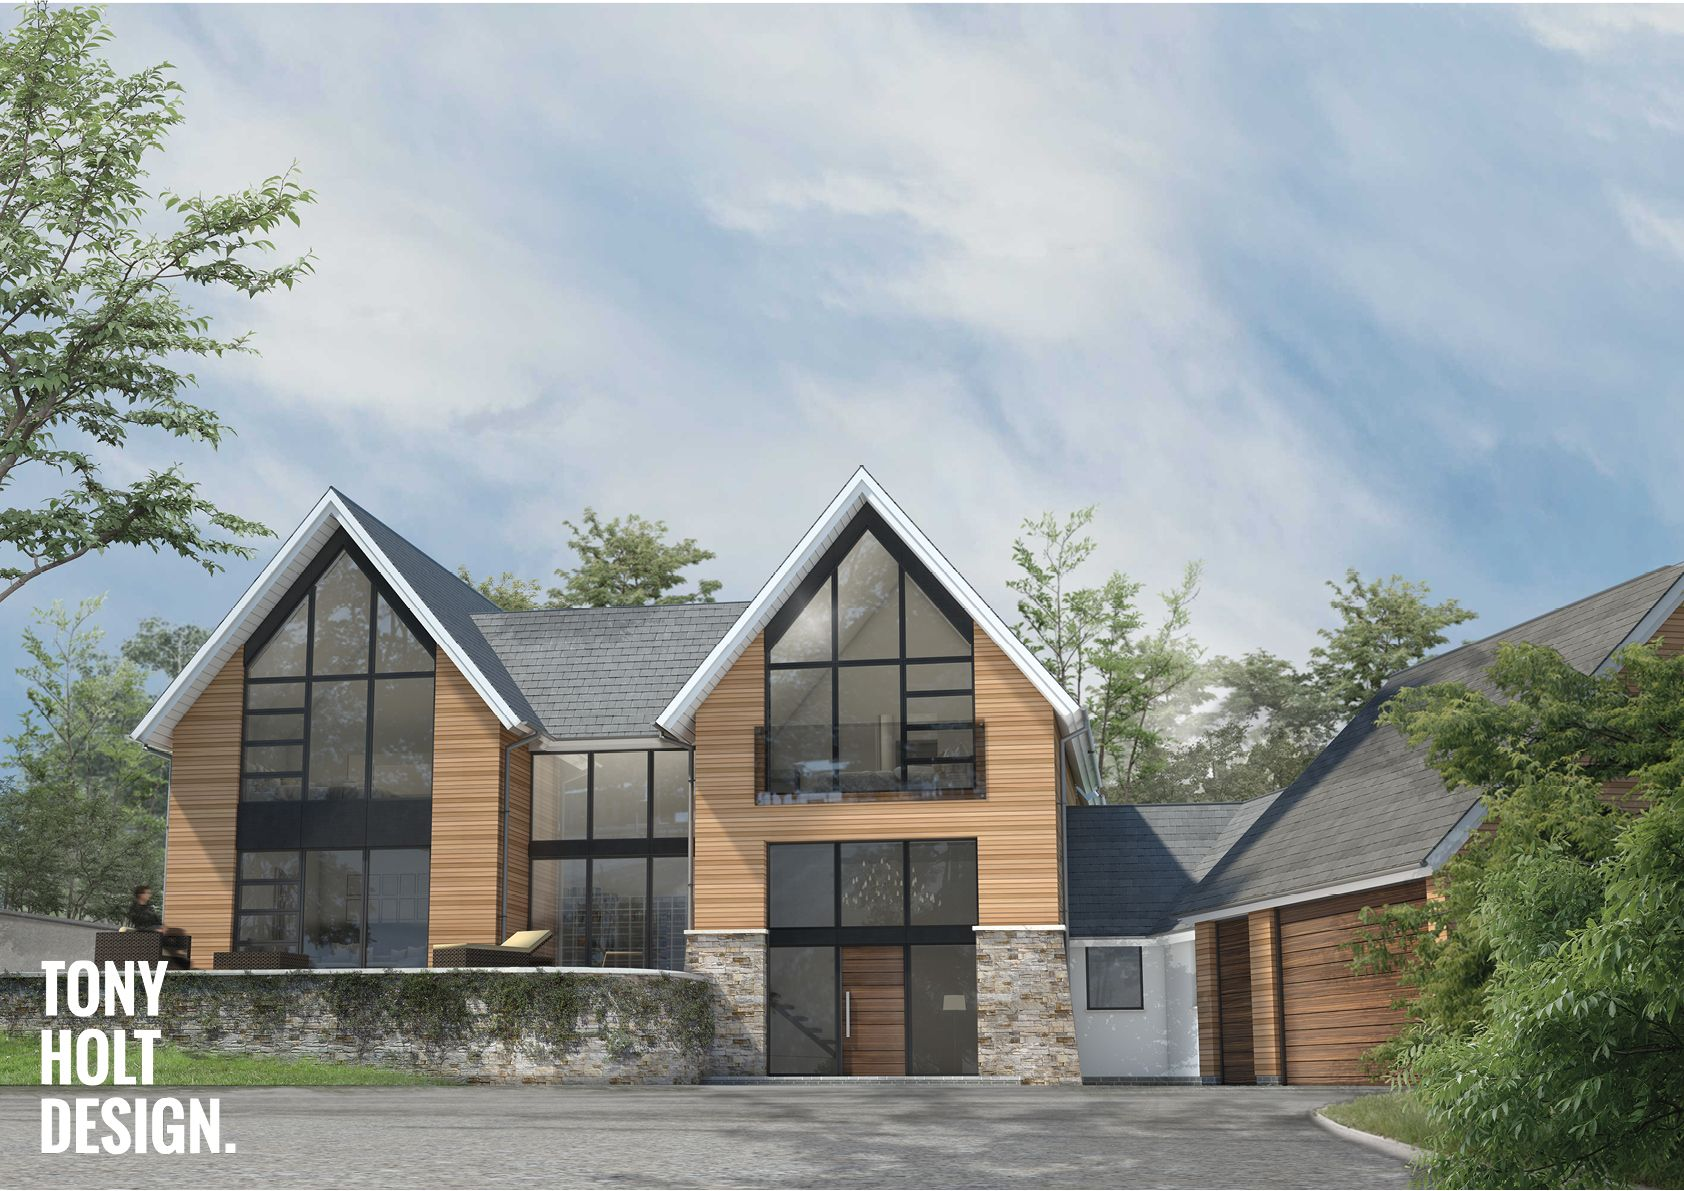 Tony Holt Design : Self build design for new build house in Dartford ...